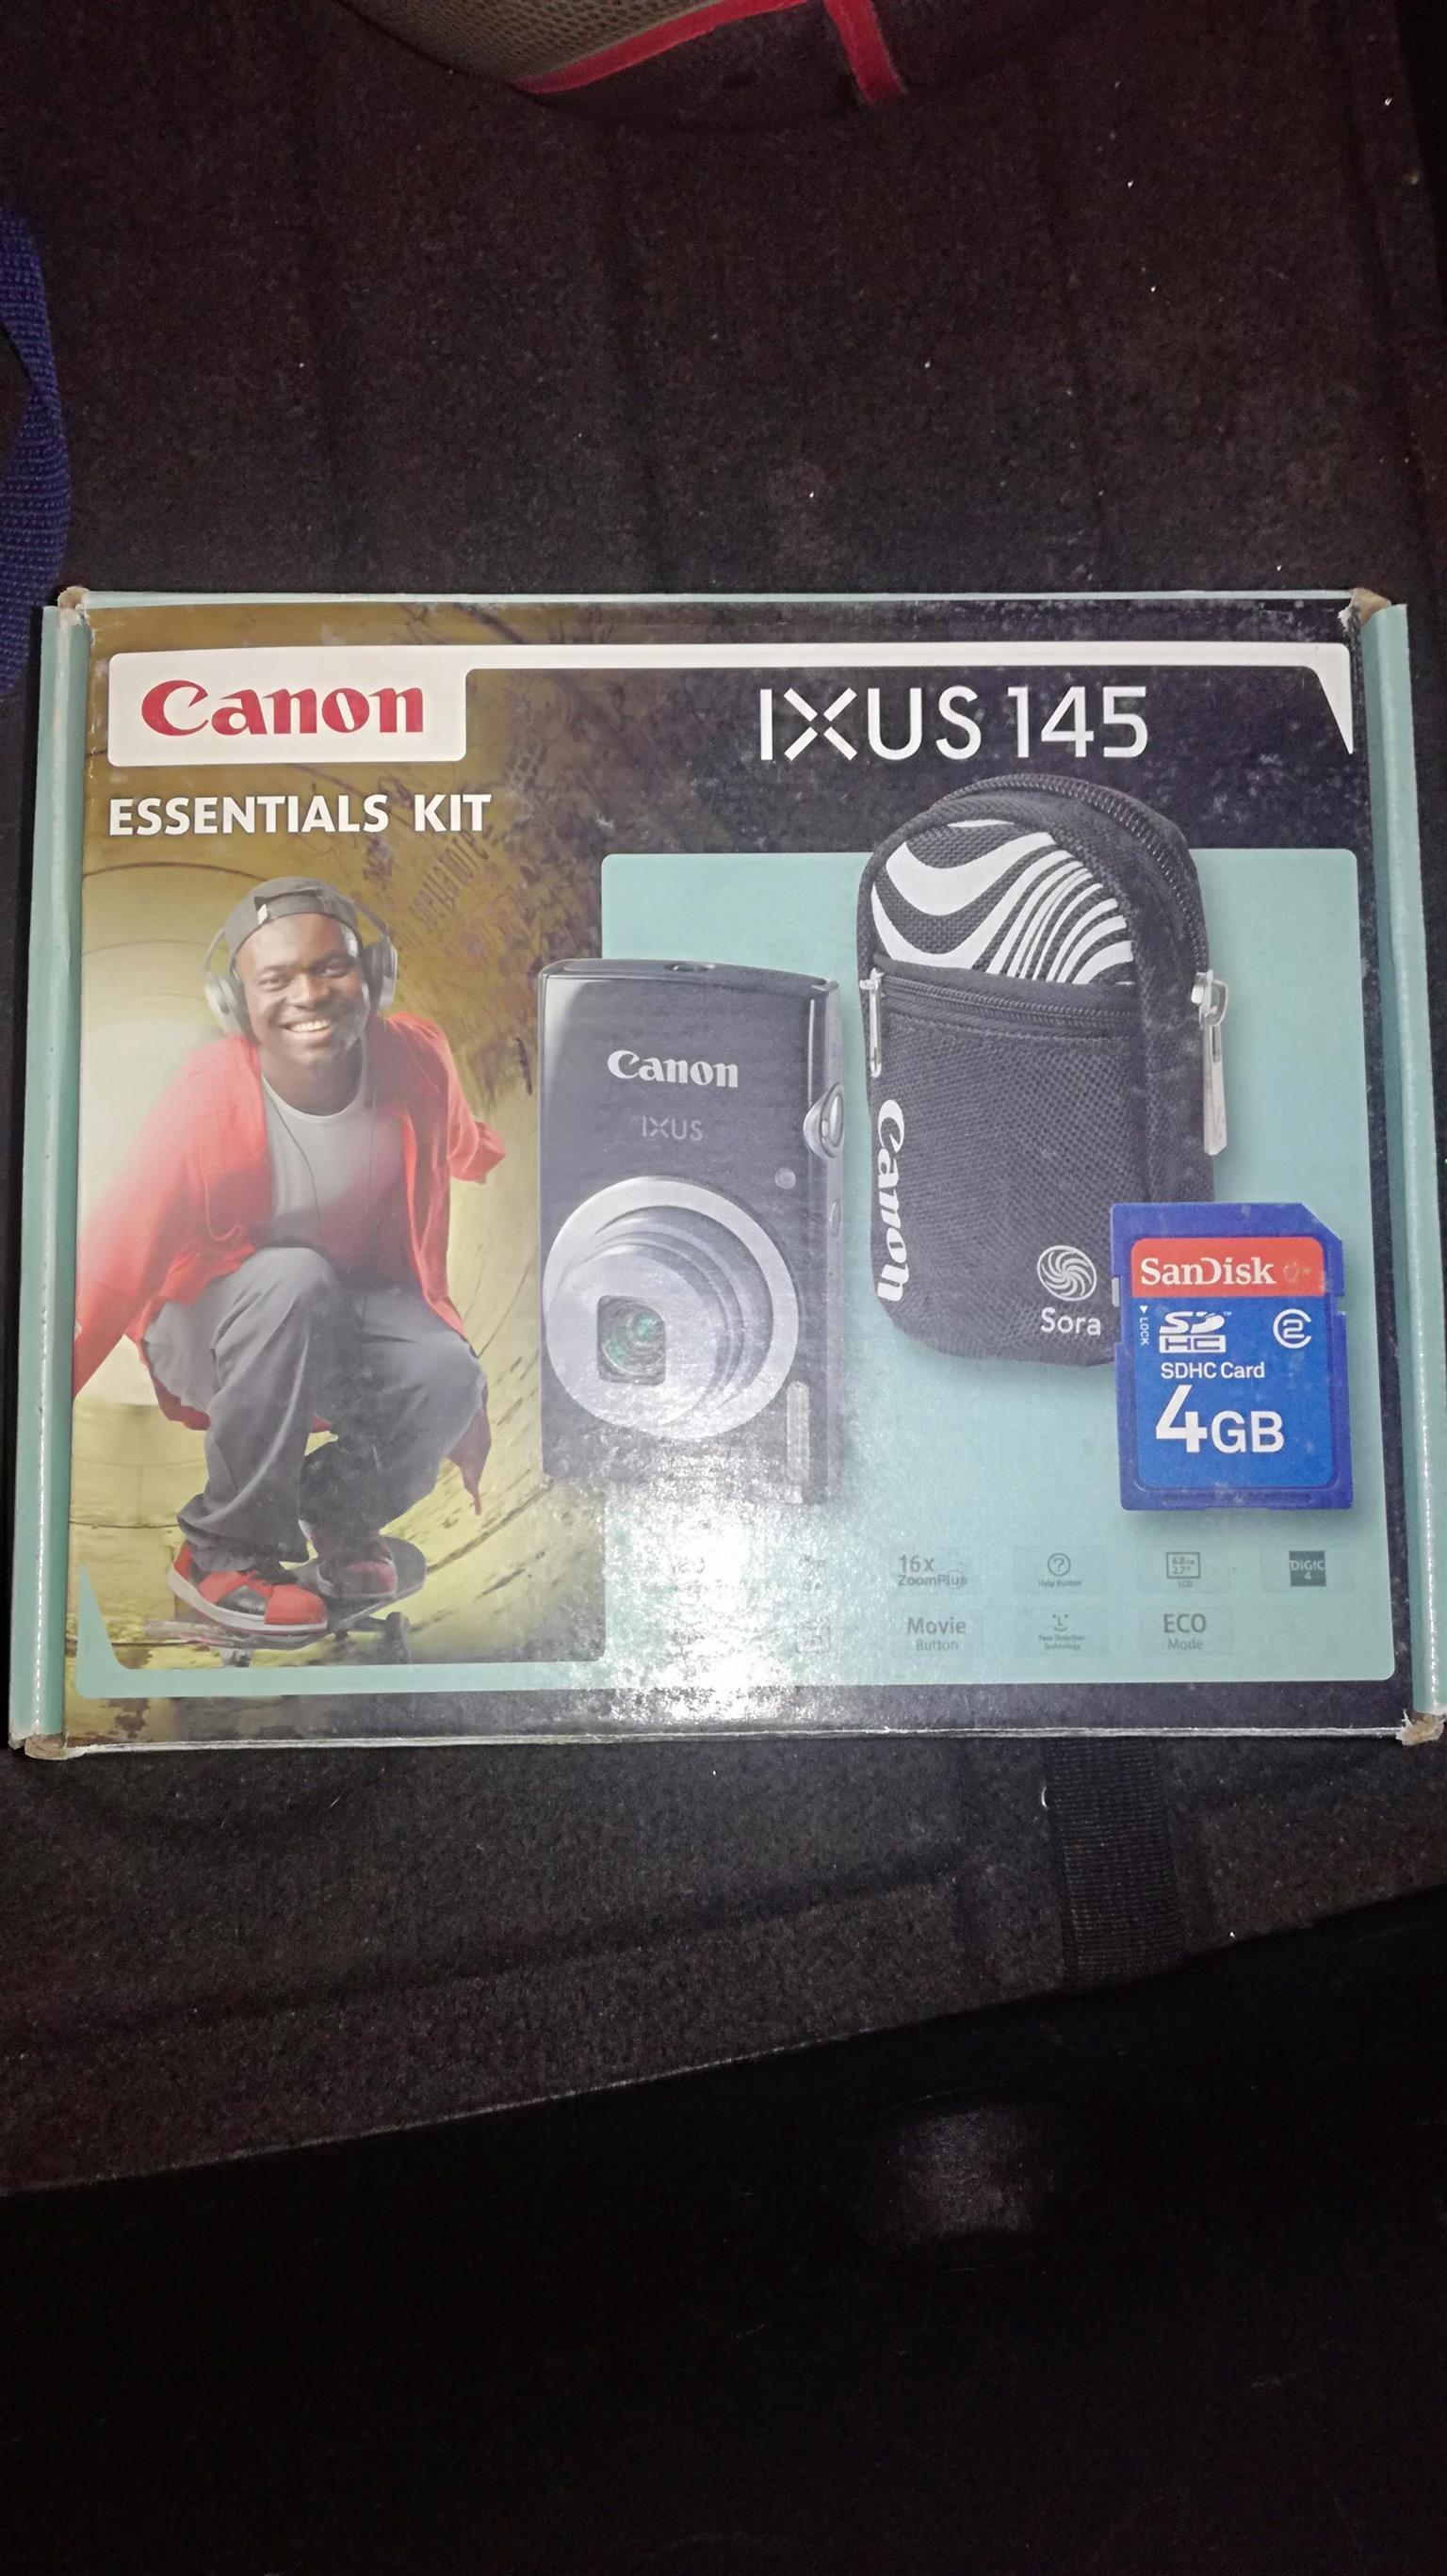 Canon IXUS 145 Digital Camera For Sale